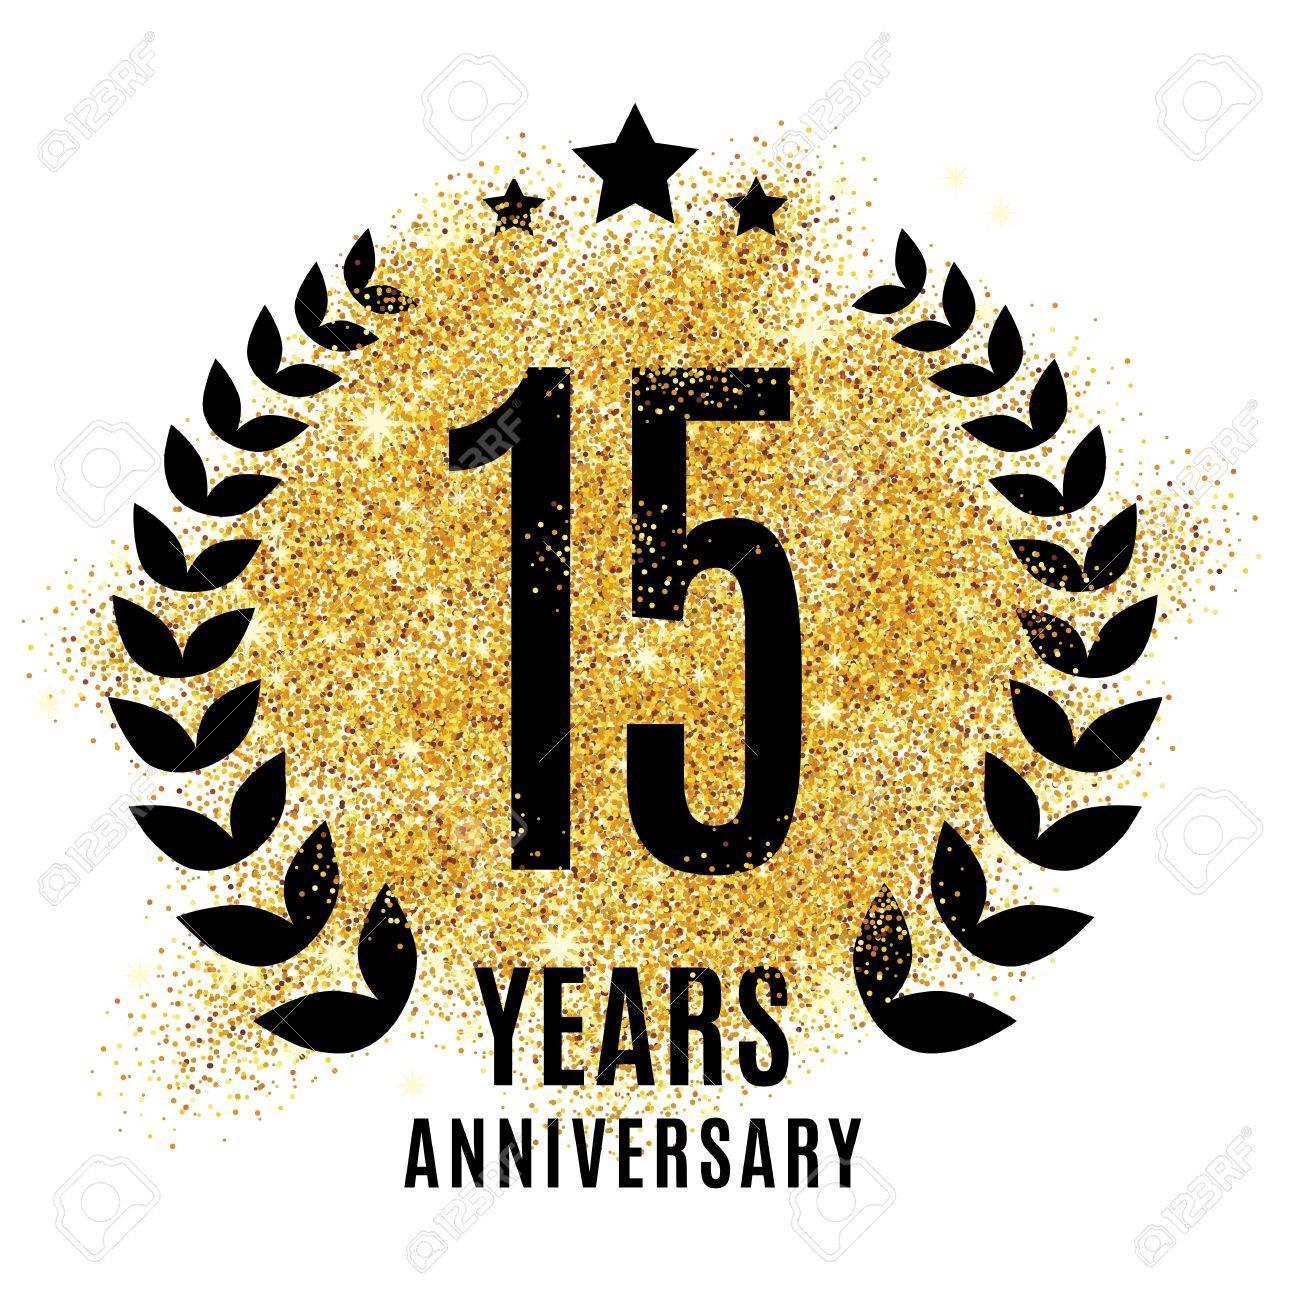 Fifteen Years Golden Anniversary Sign Gold Glitter Celebration